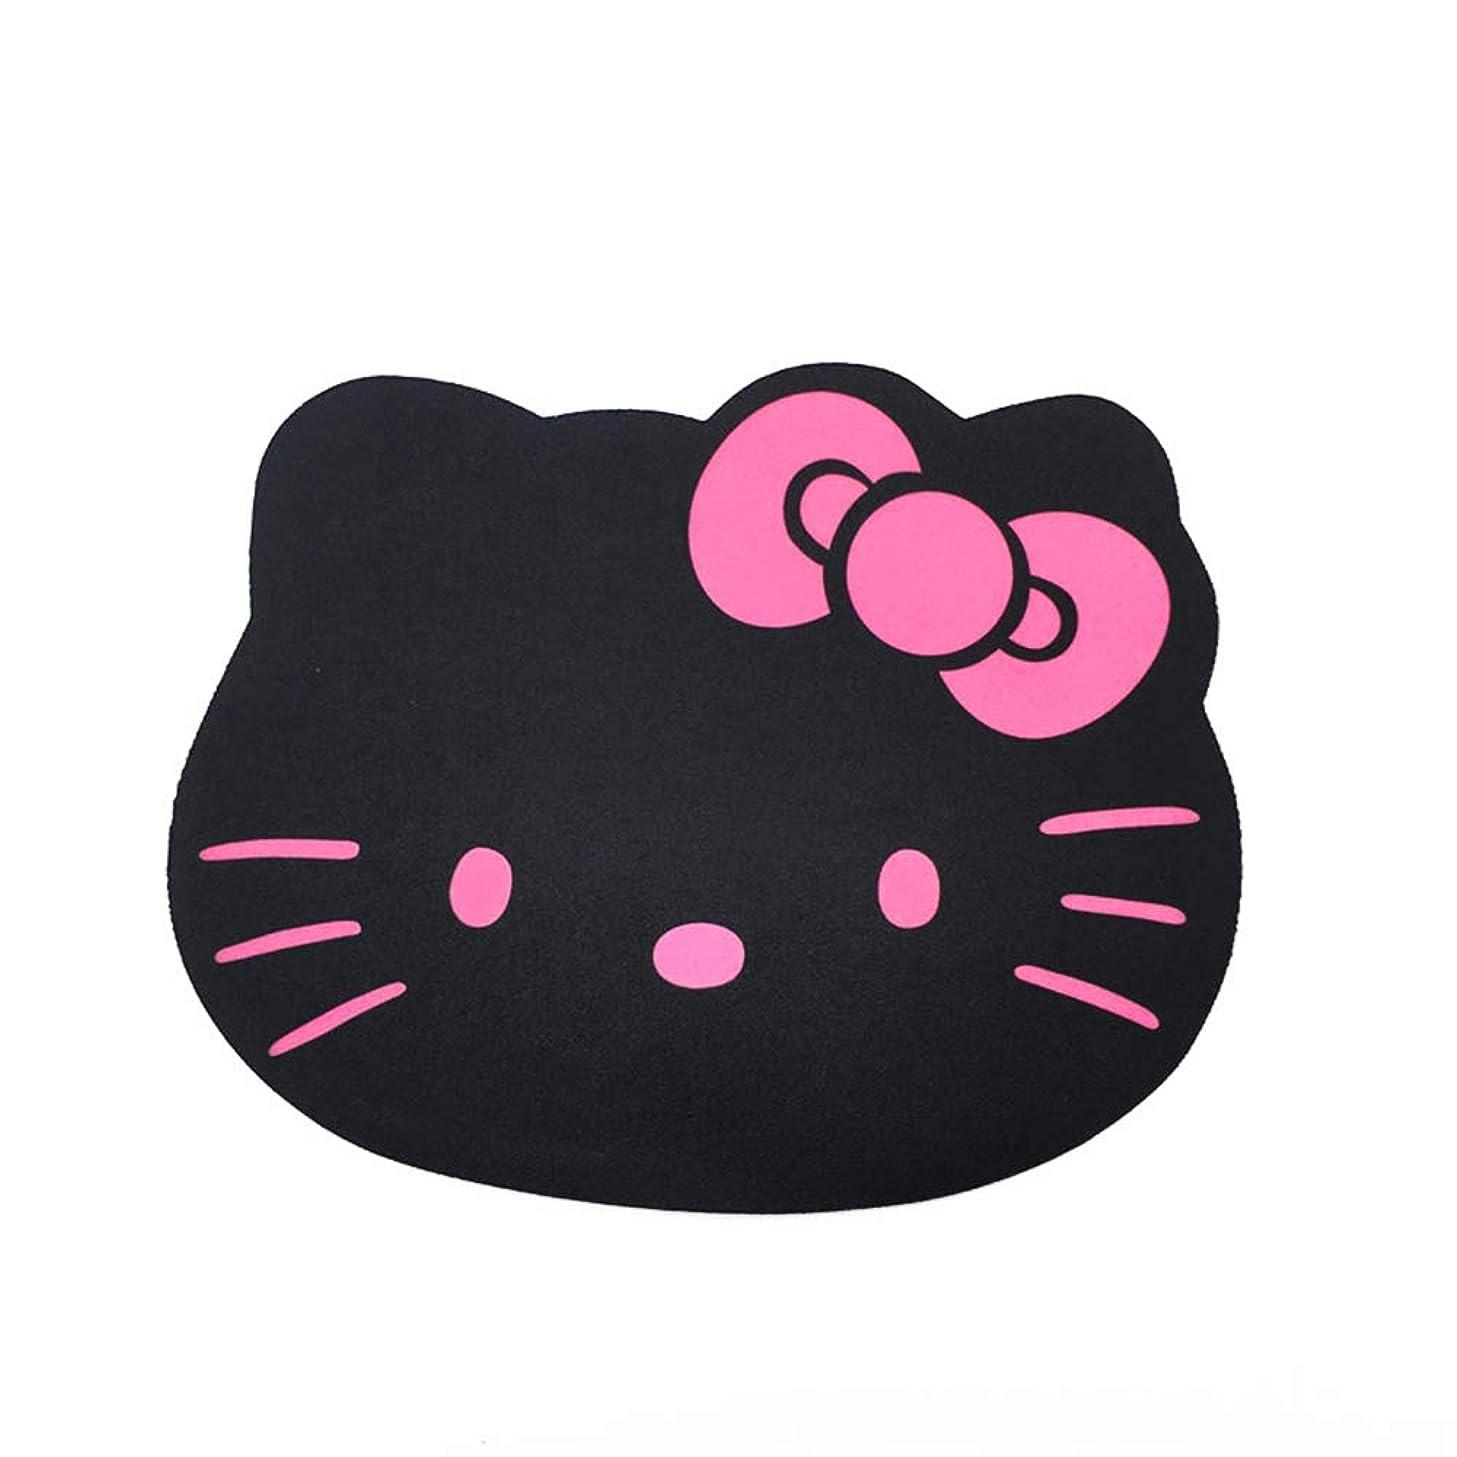 Famixyal Fashion Cartoon Hello Kitty Optical Mouse pad Personalized Computer Decoration Mouse Pad Mat Non-toxic Tasteless Mice Mat Mousepad (Black)